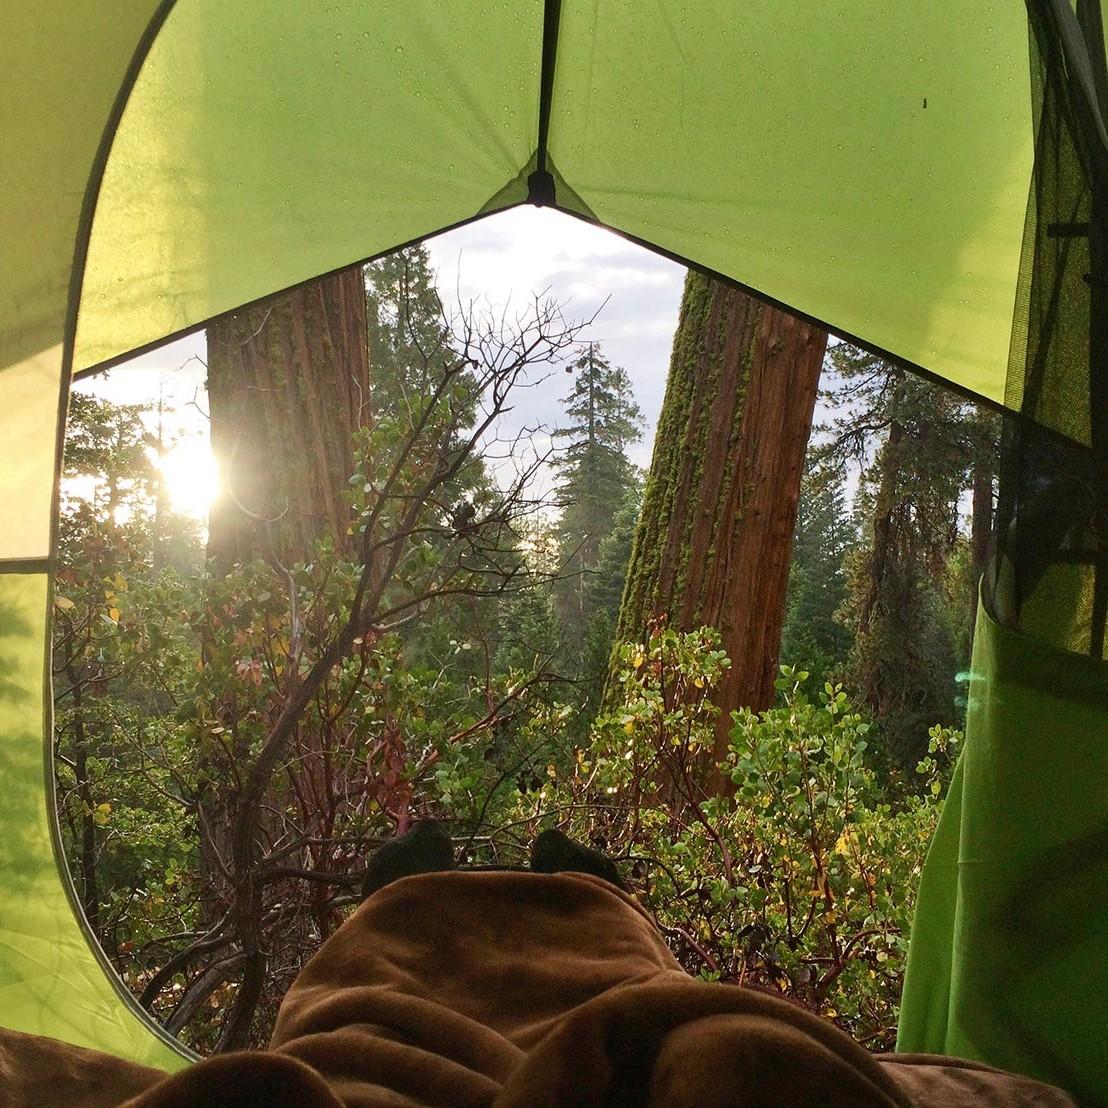 Steve-Paul-Crisp-Morning-Air-camptrend